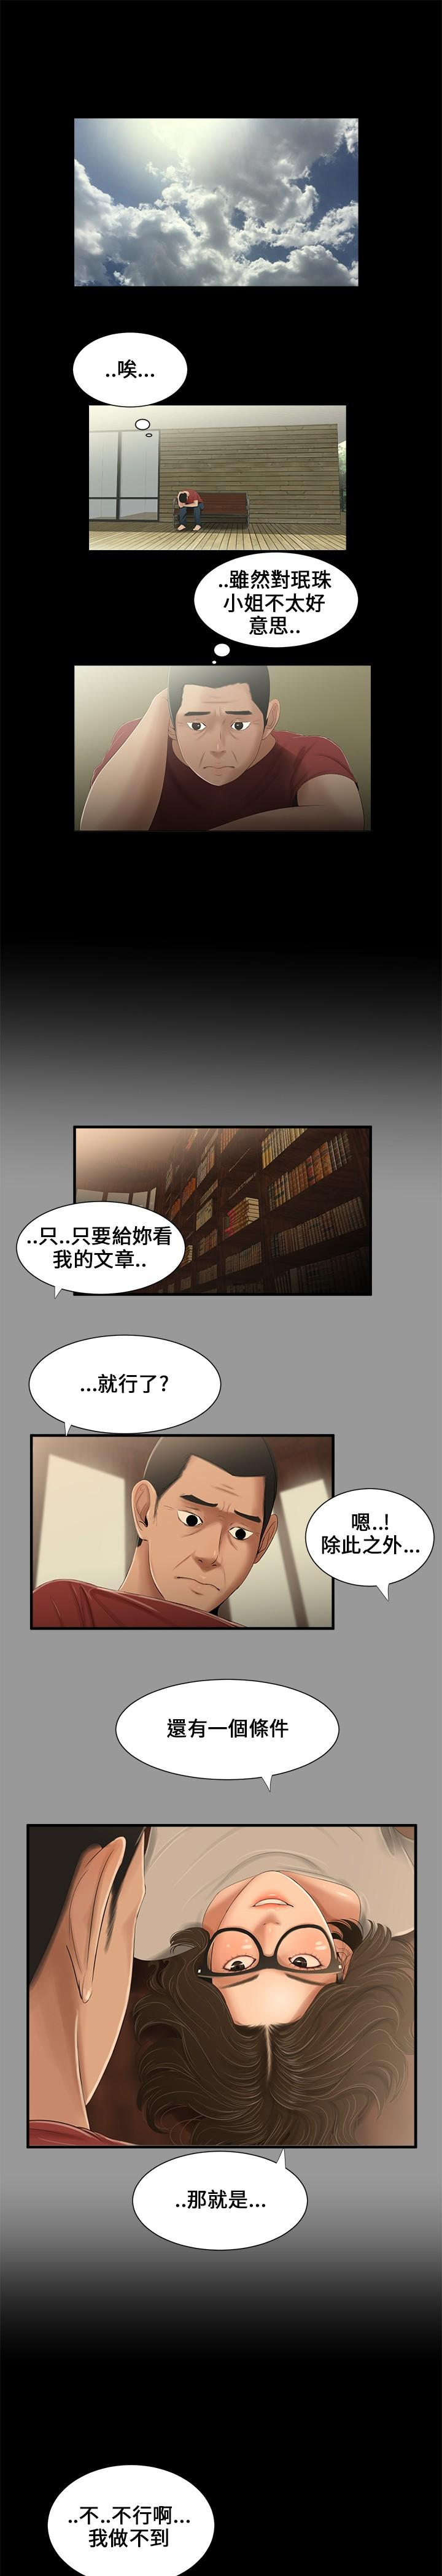 Three sisters 三姐妹Ch.13~19 (Chinese)中文 16